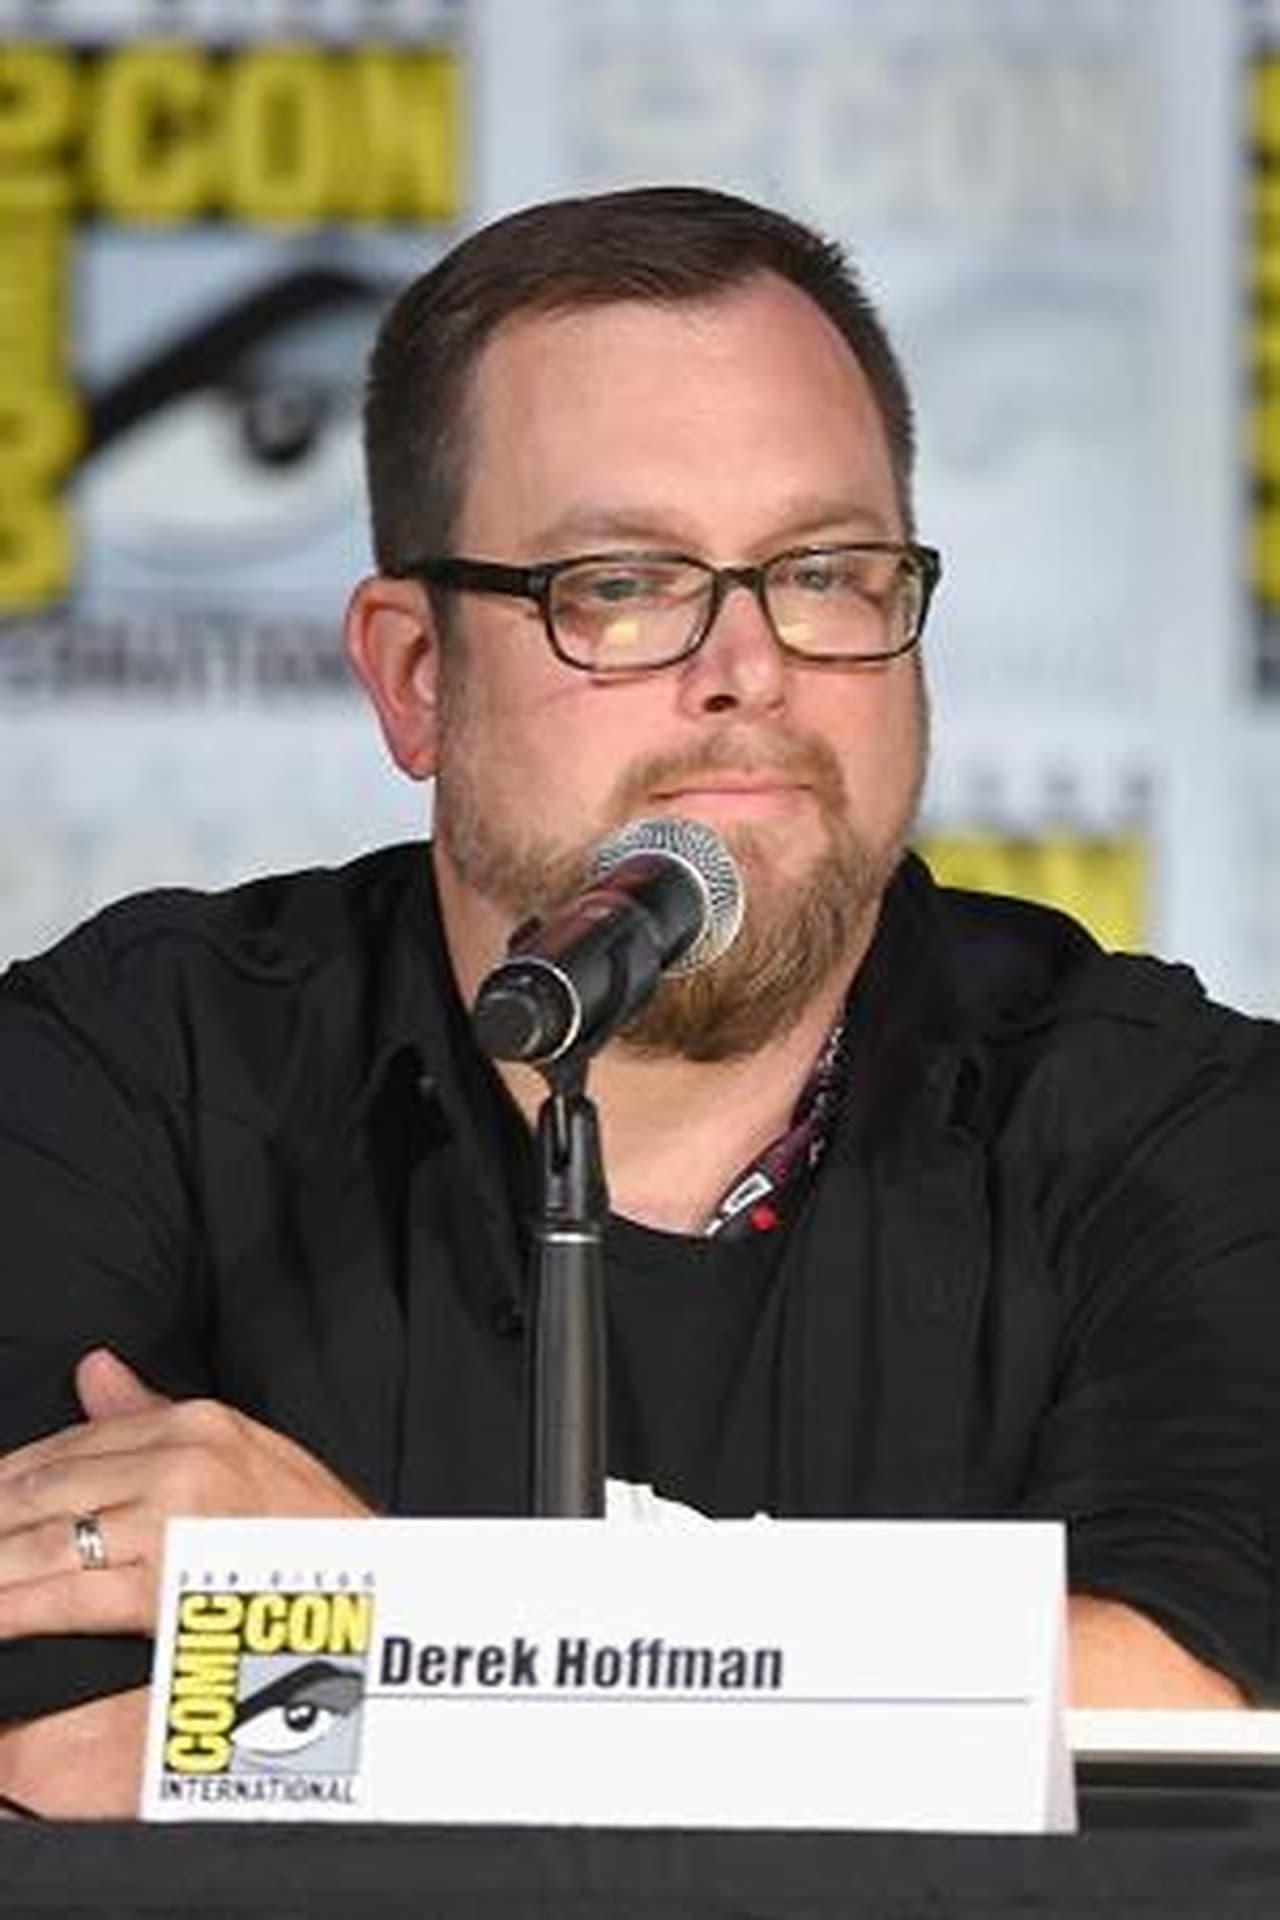 Derek Hoffman